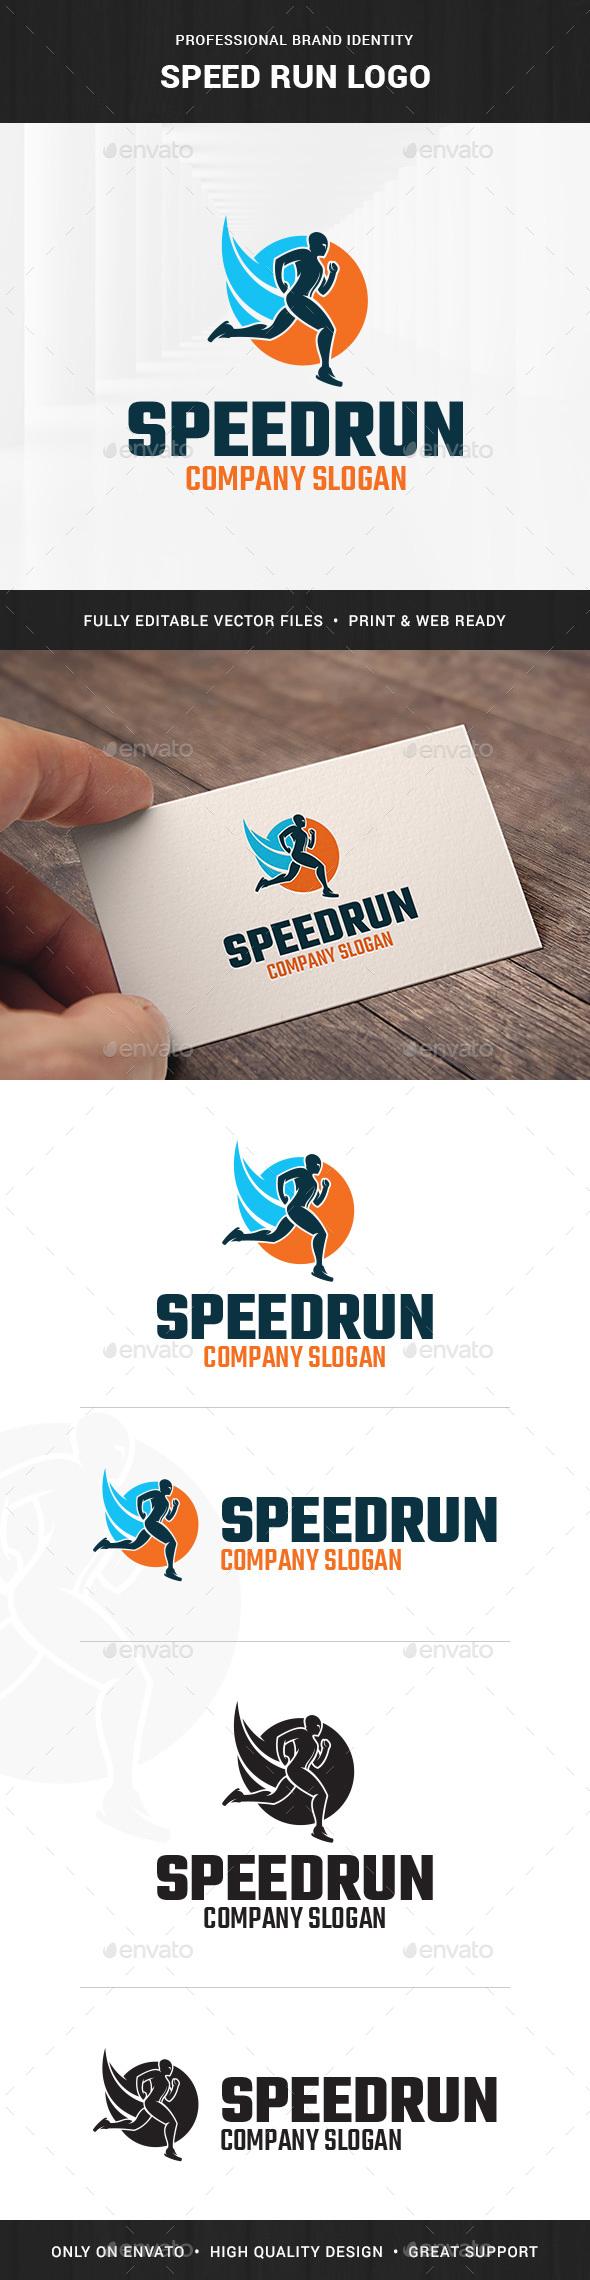 Speed Run Logo Template